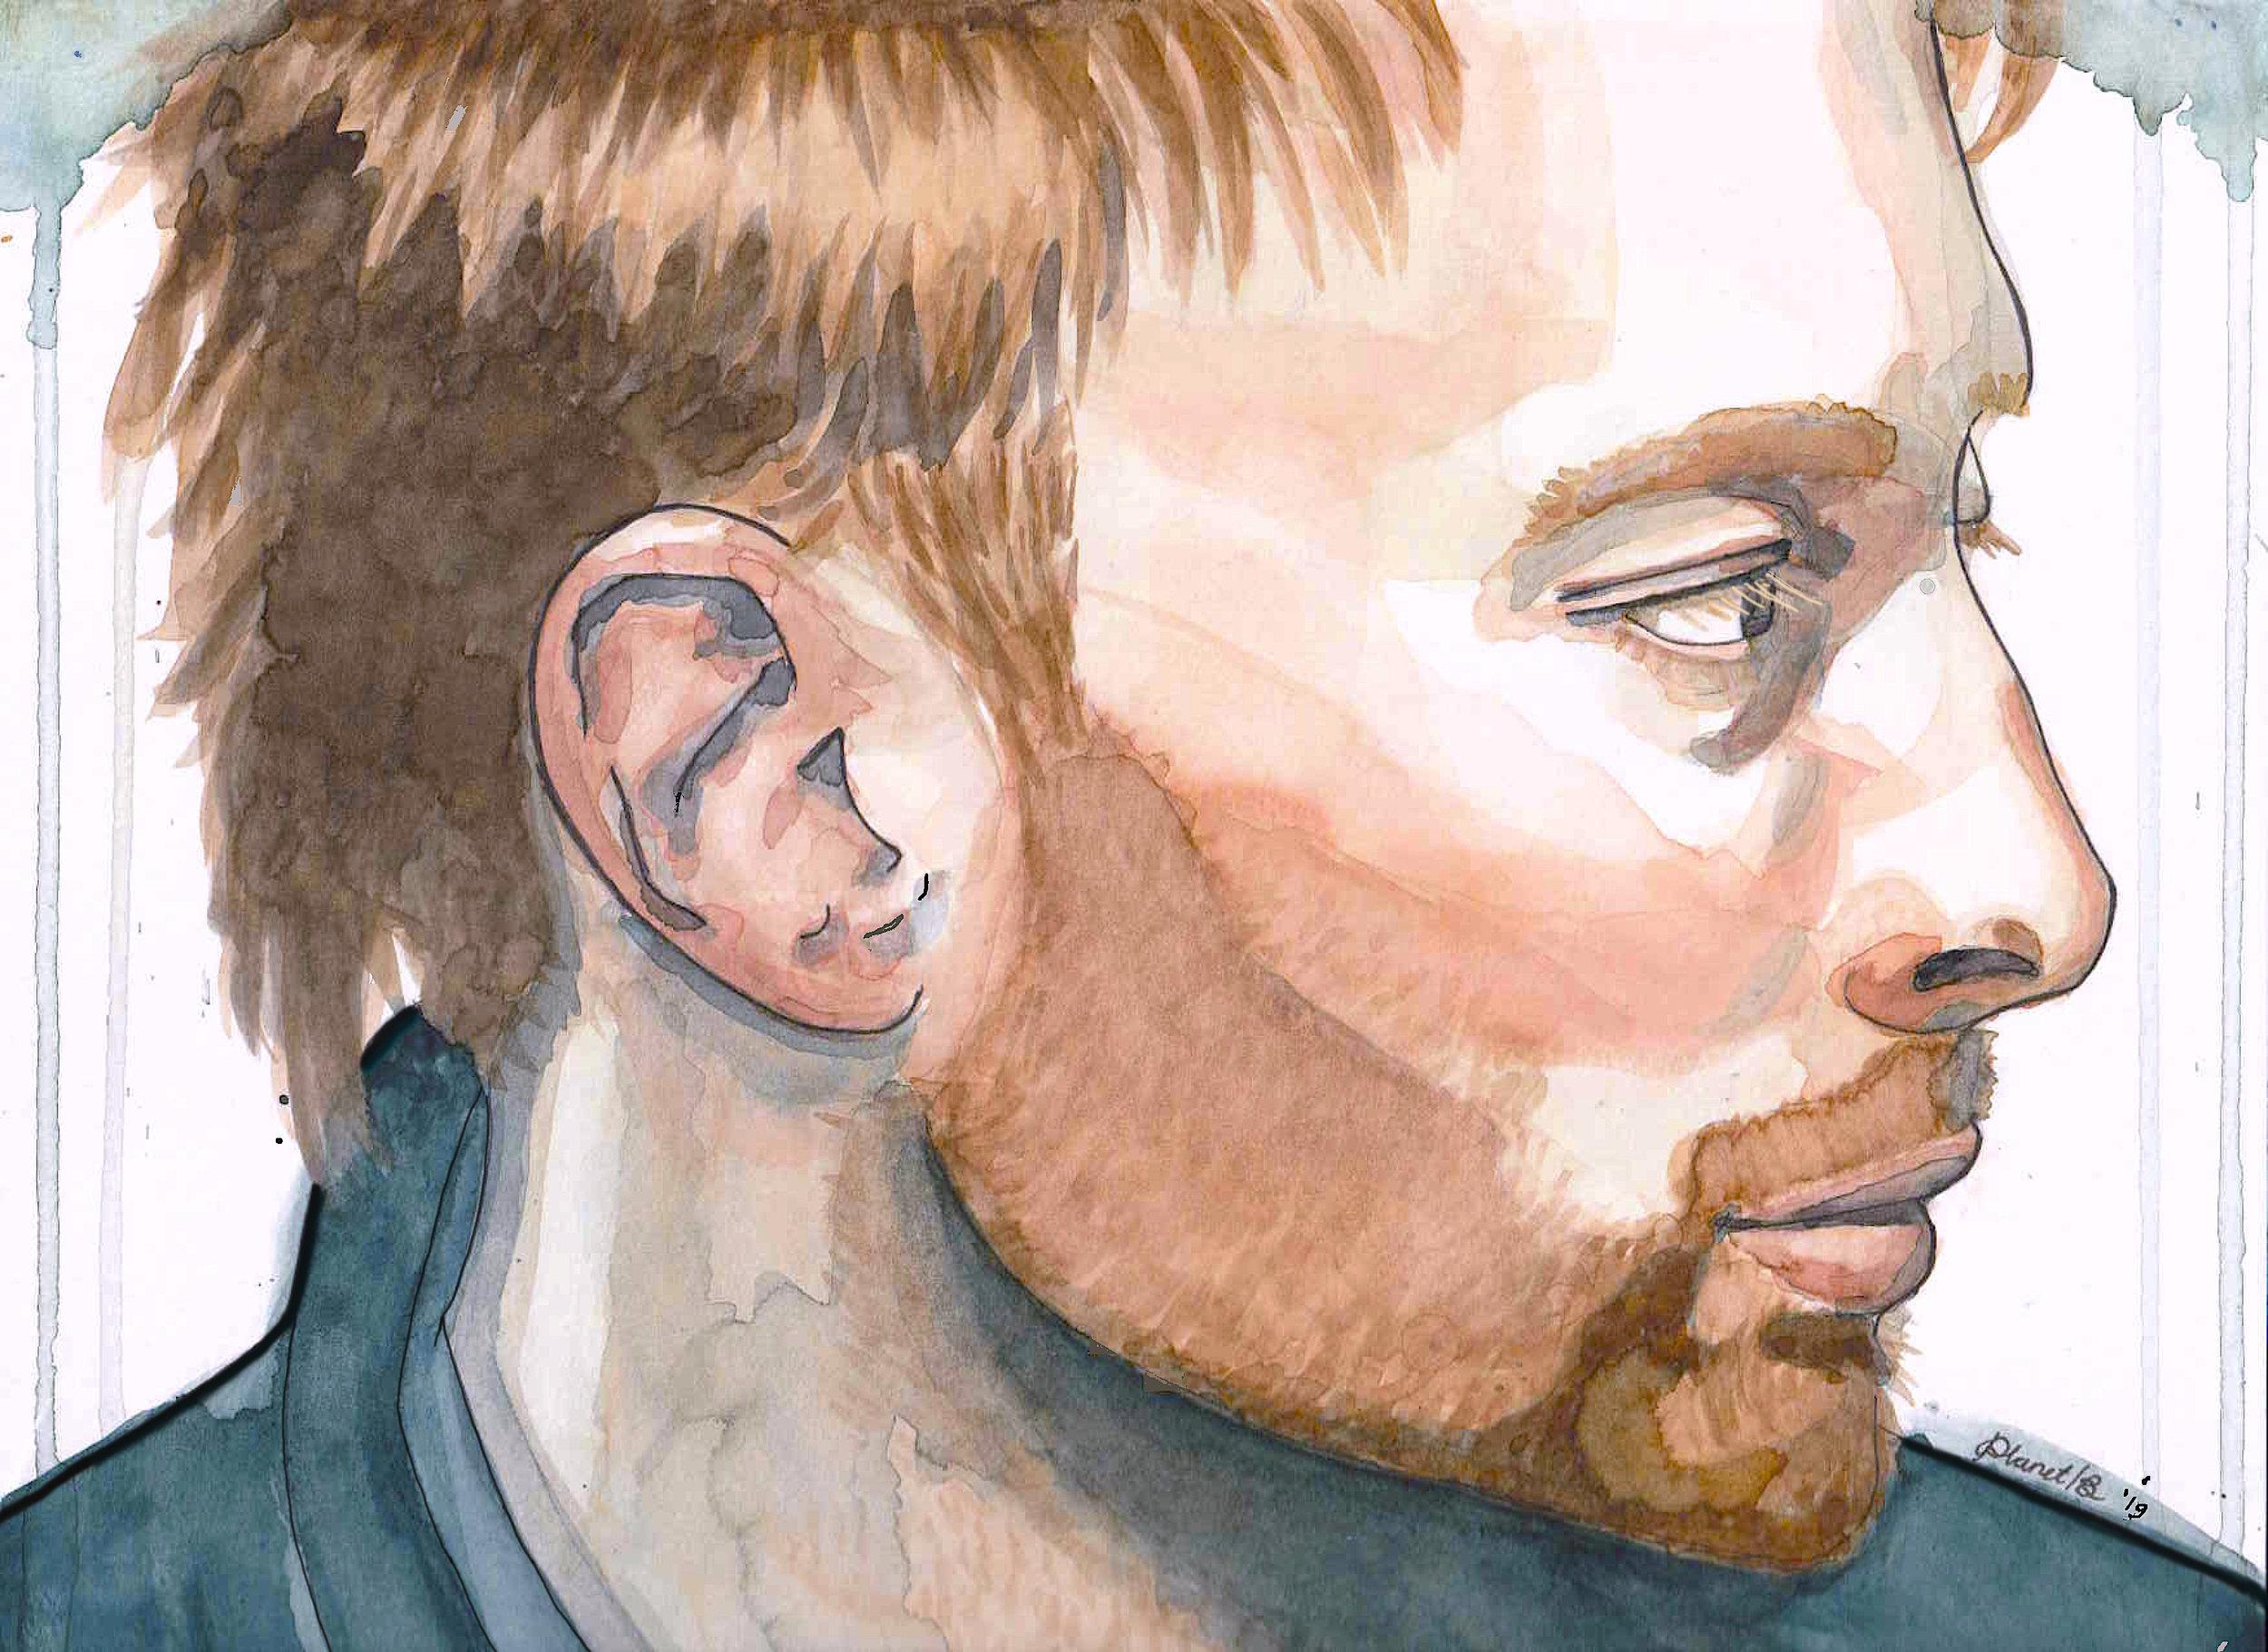 Thom Yorke radiohead tekening portret inkt en aqaurelverf